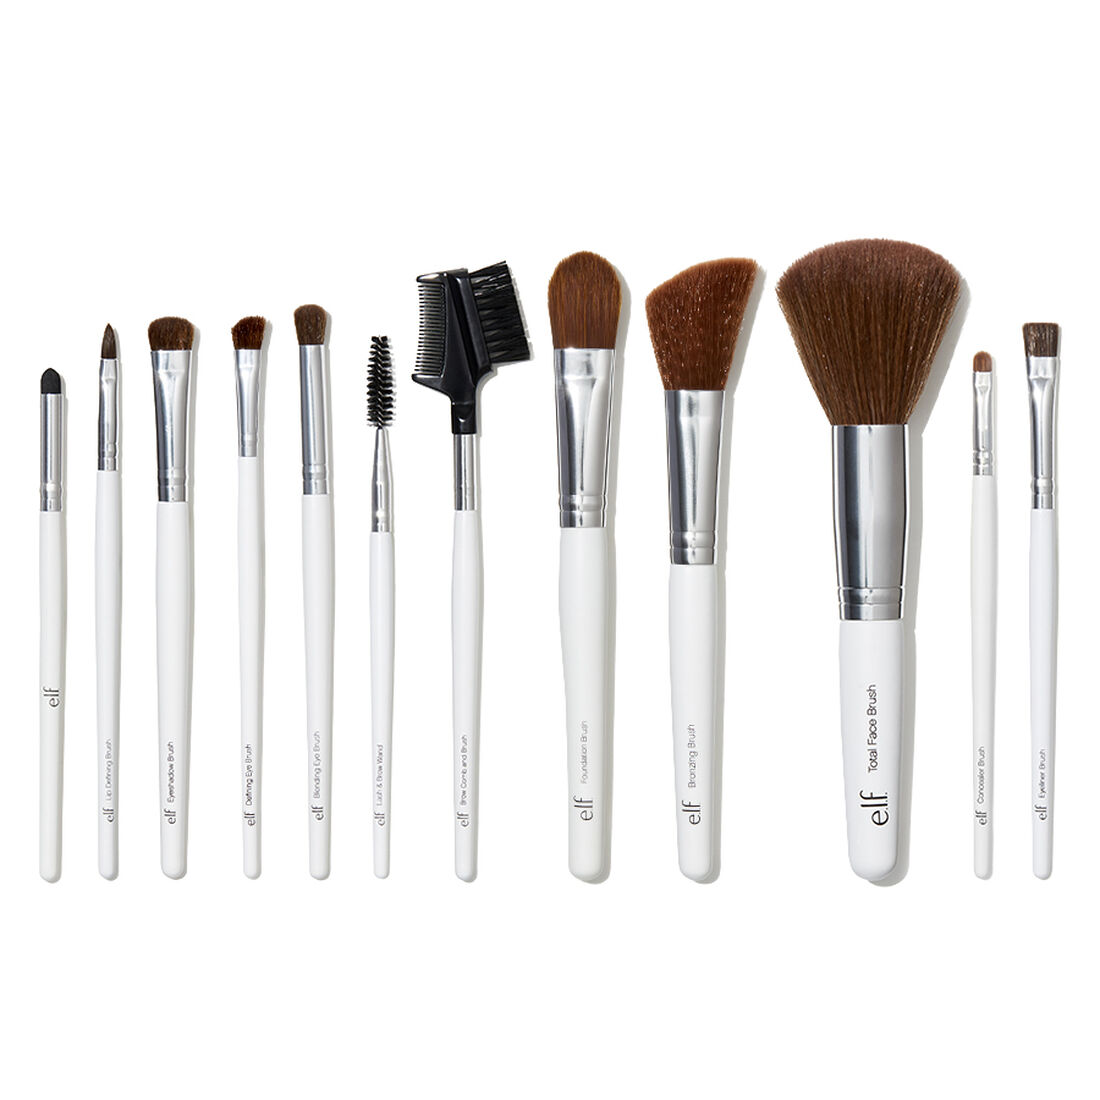 ELF Cosmetics - Professional Set of 12 Brushes